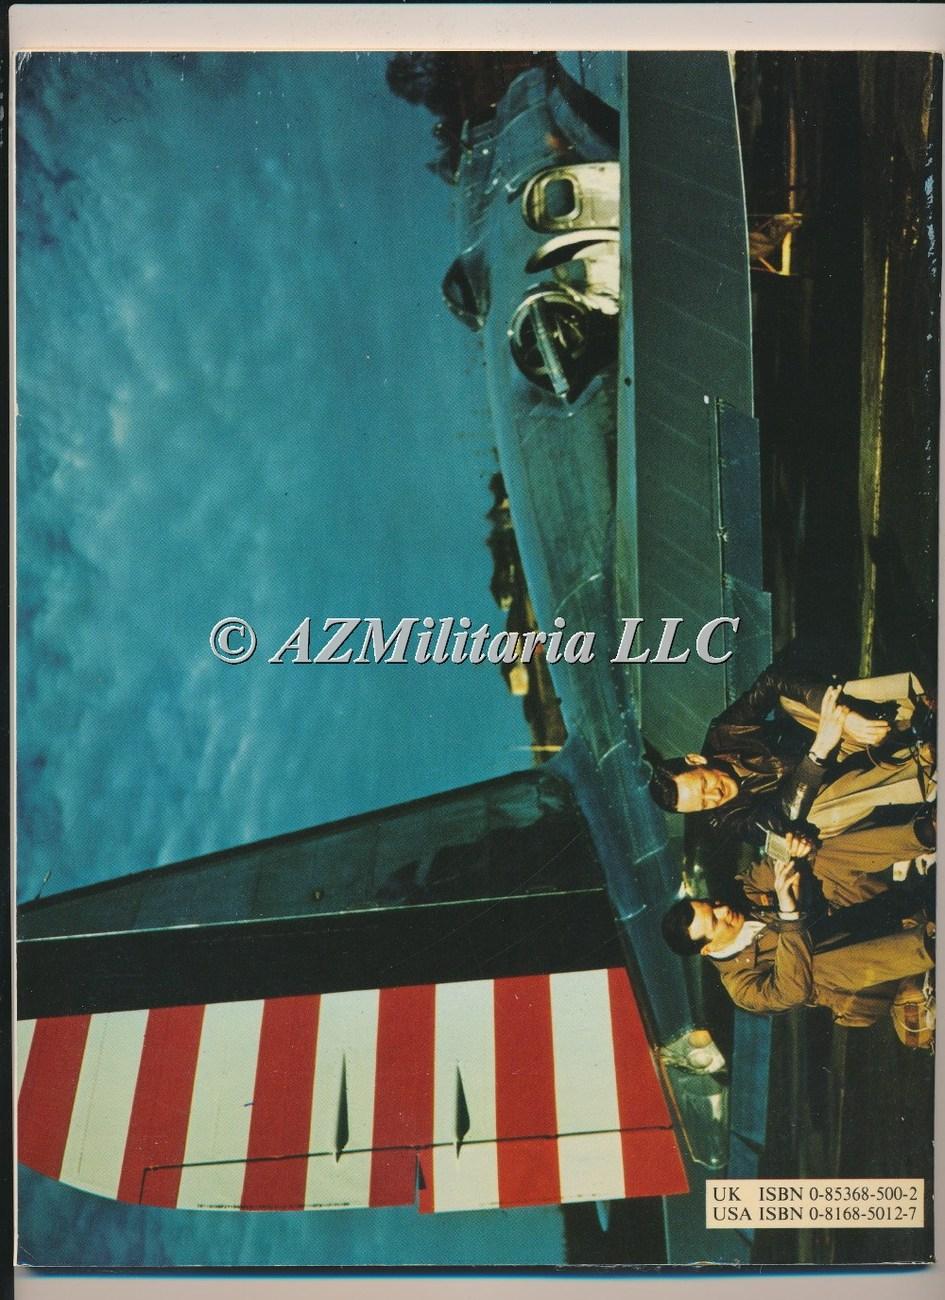 B-17 Flying Fortress Part I Production Versions D&S VOL 2